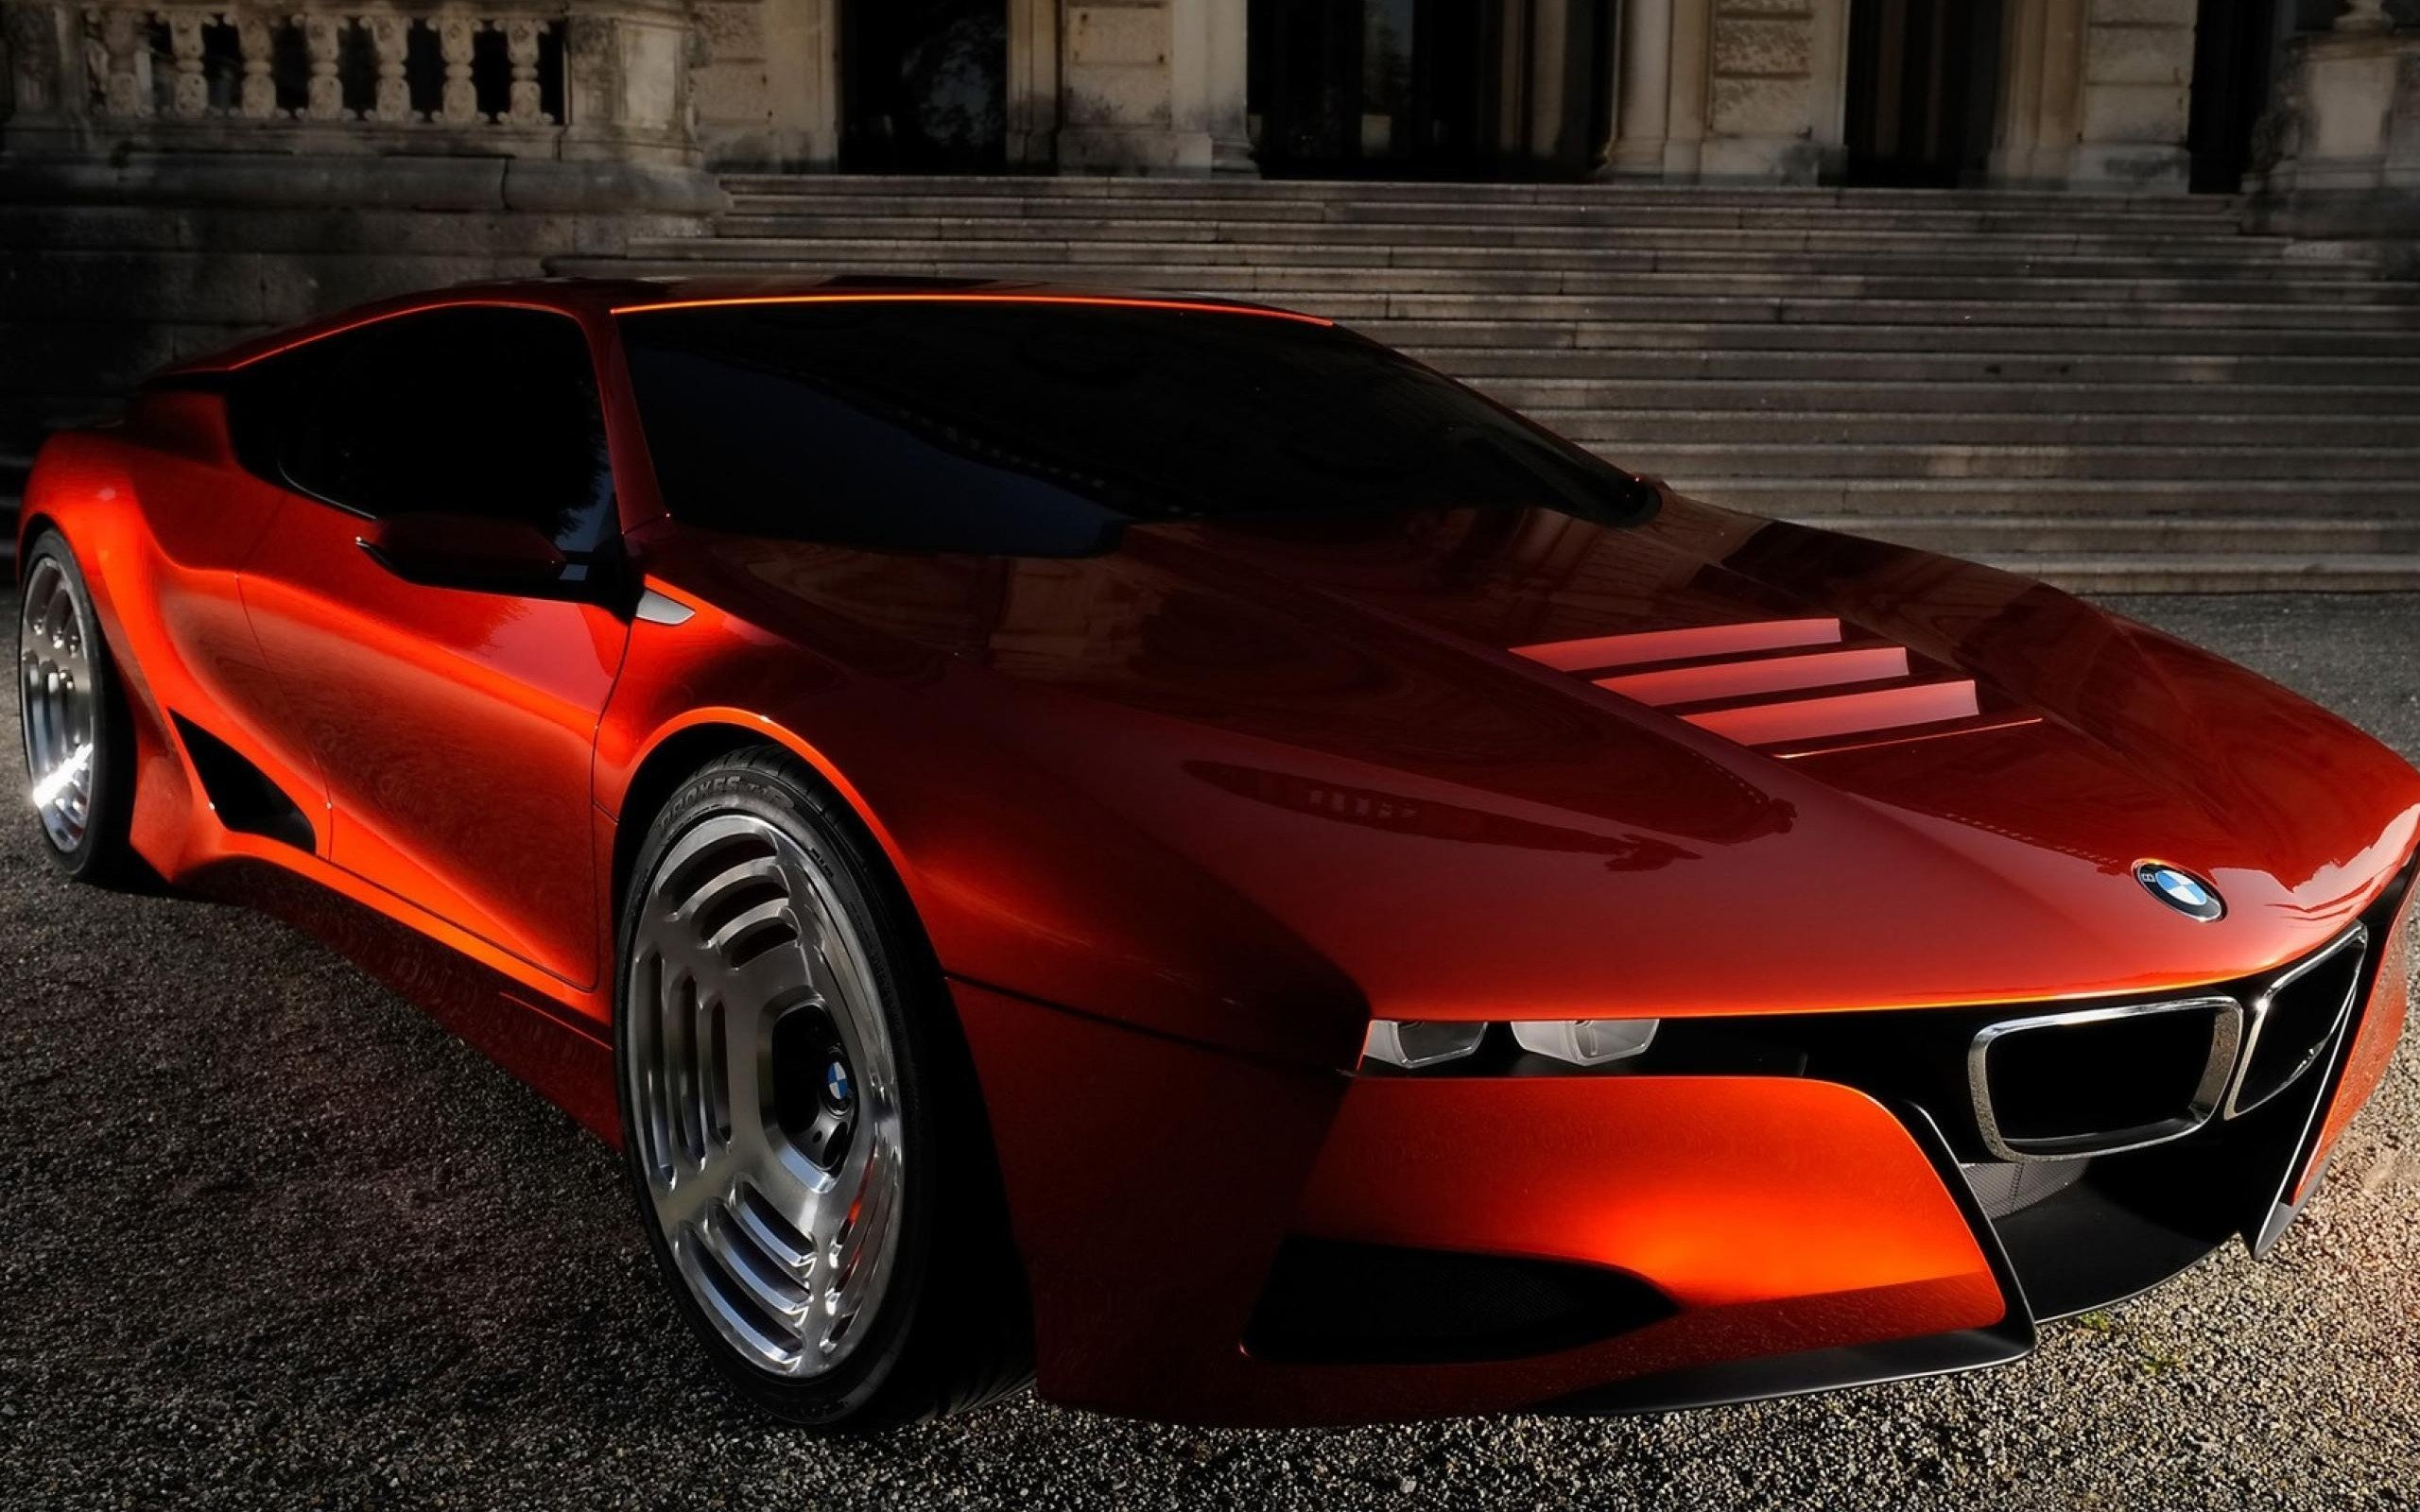 bmw futuristic concept art concept cars sports cars orange cars bmw m1 future cars wallpaper 2560x1600 300855 wallpaperup - Sports Cars Of The Future